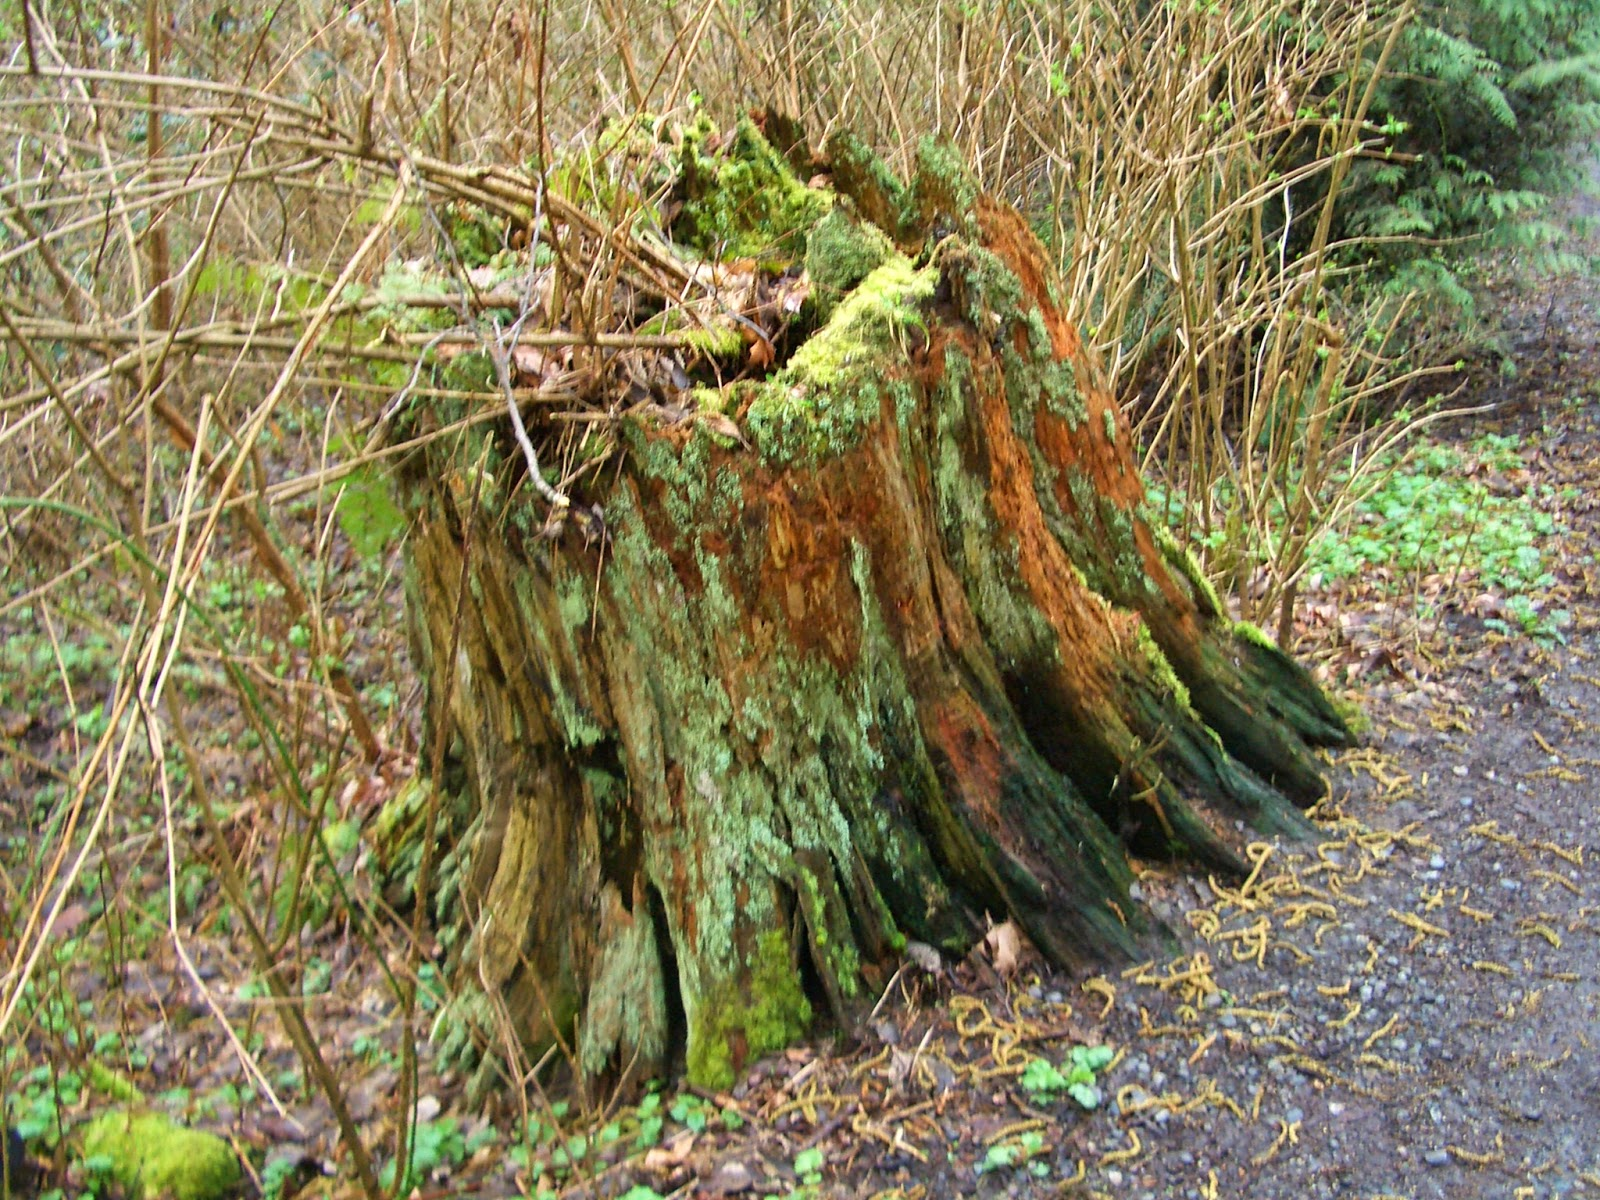 how to kill fungii around tree stump